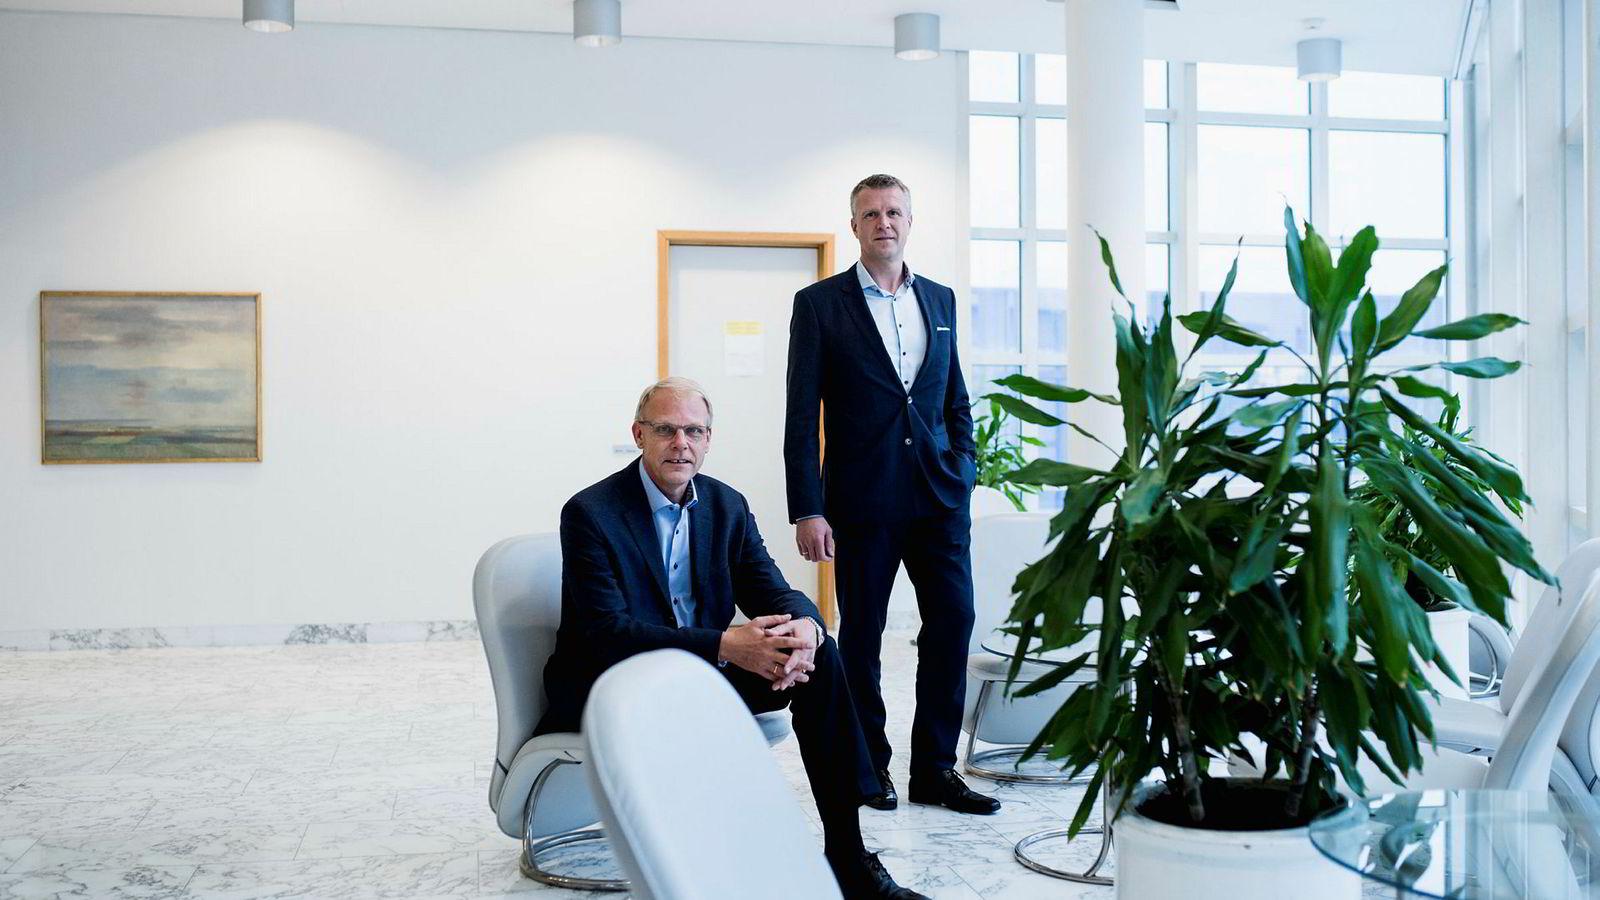 Morten Mauritzen, til venstre, er administrerende direktør i Point Resources fra og med i dag, mens Jan Harald Solstad, til høyre, går tilbake til partnerstillingen sin i HitecVision. Foto: Tommy Ellingsen